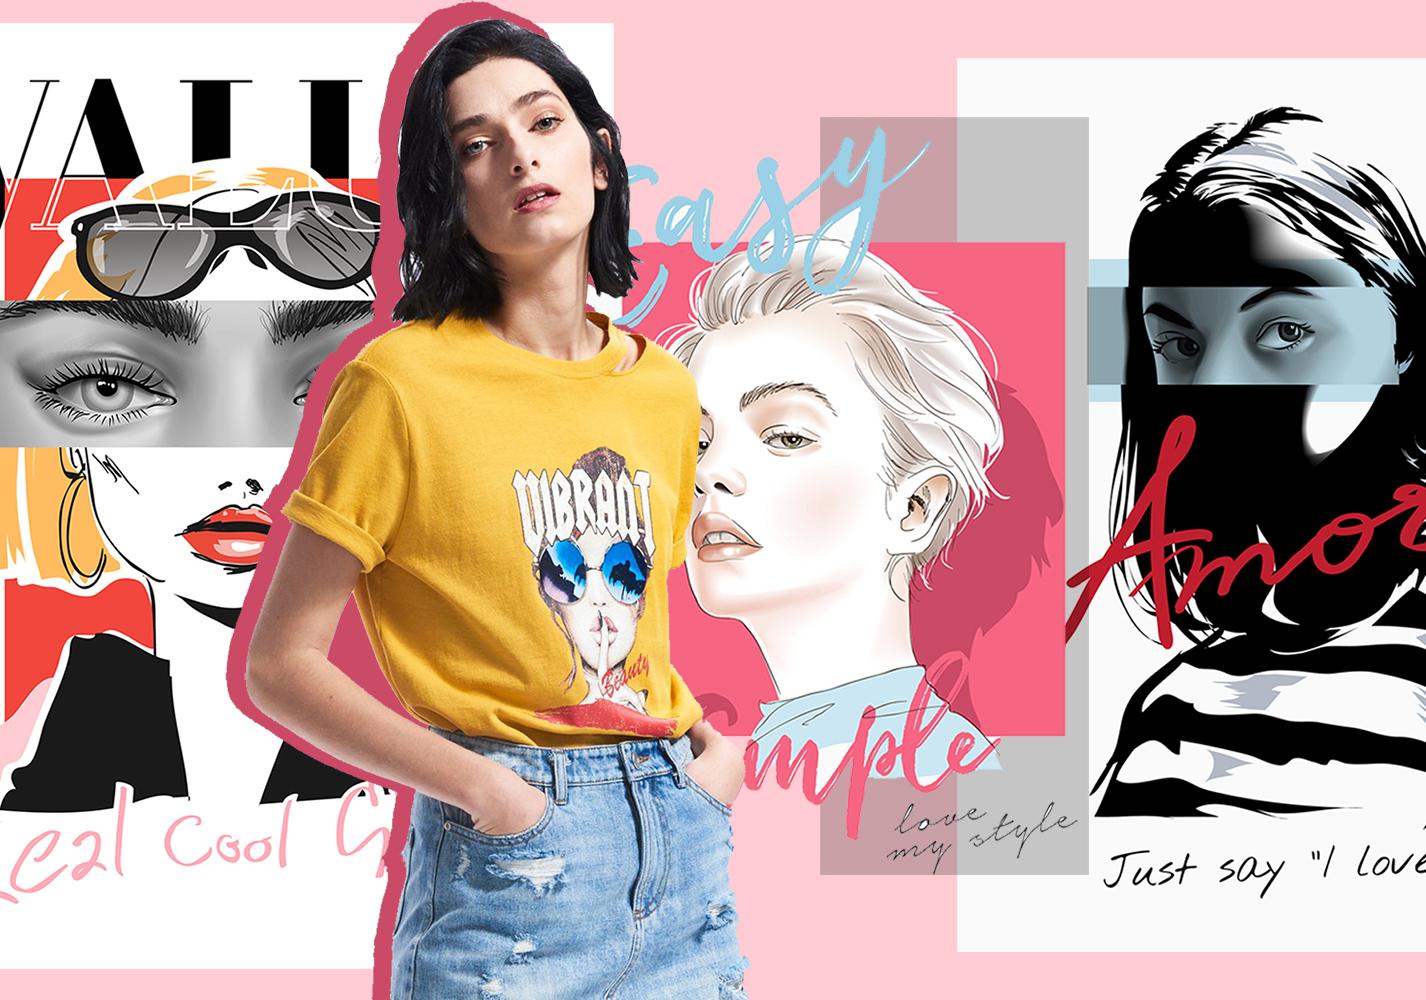 Stylish Girl -- 2020 S/S Pattern Trend for Womenswear